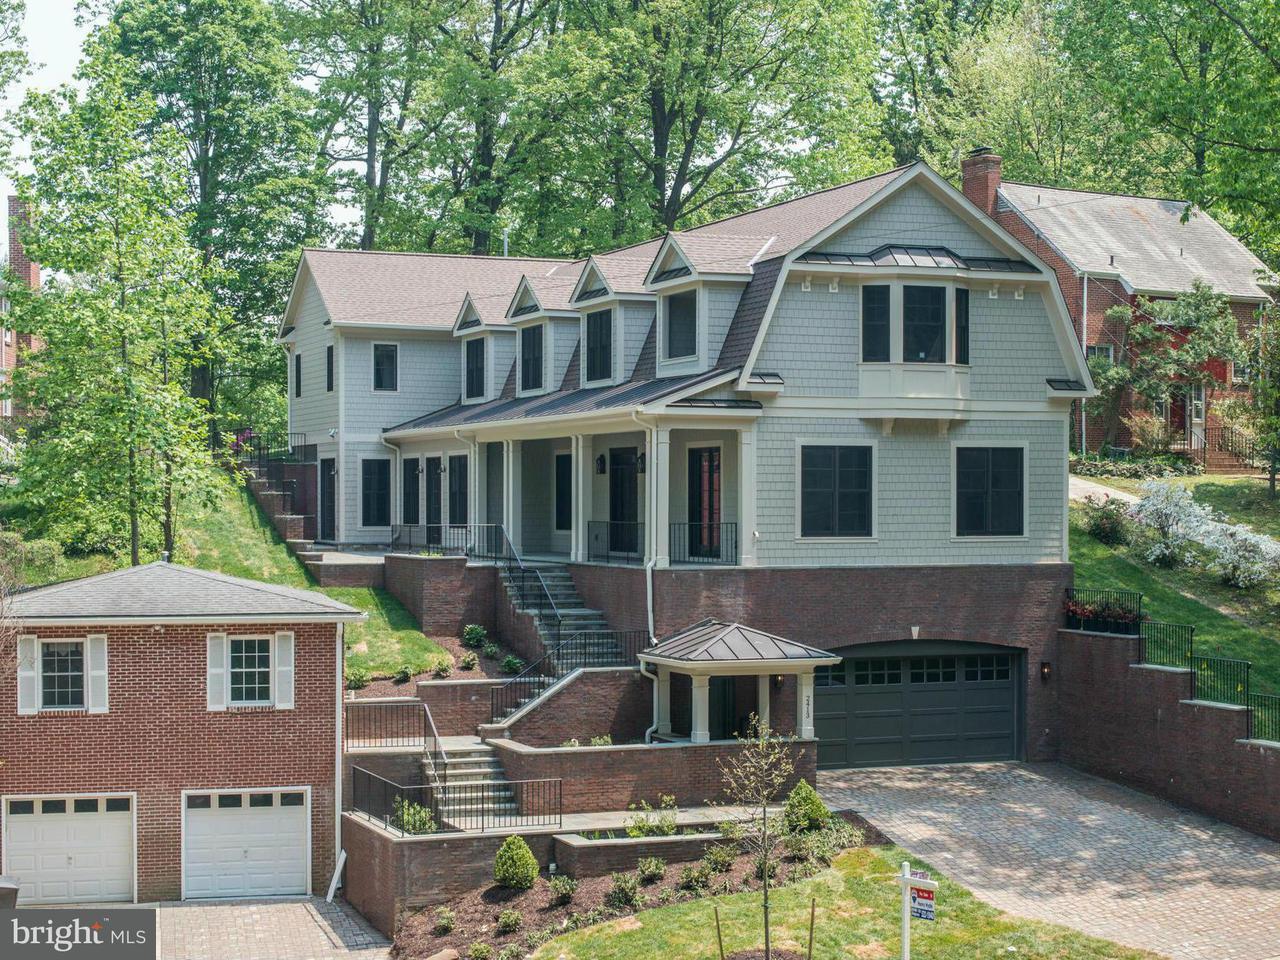 Single Family Home for Sale at 2413 N Vernon Street 2413 N Vernon Street Arlington, Virginia 22207 United States